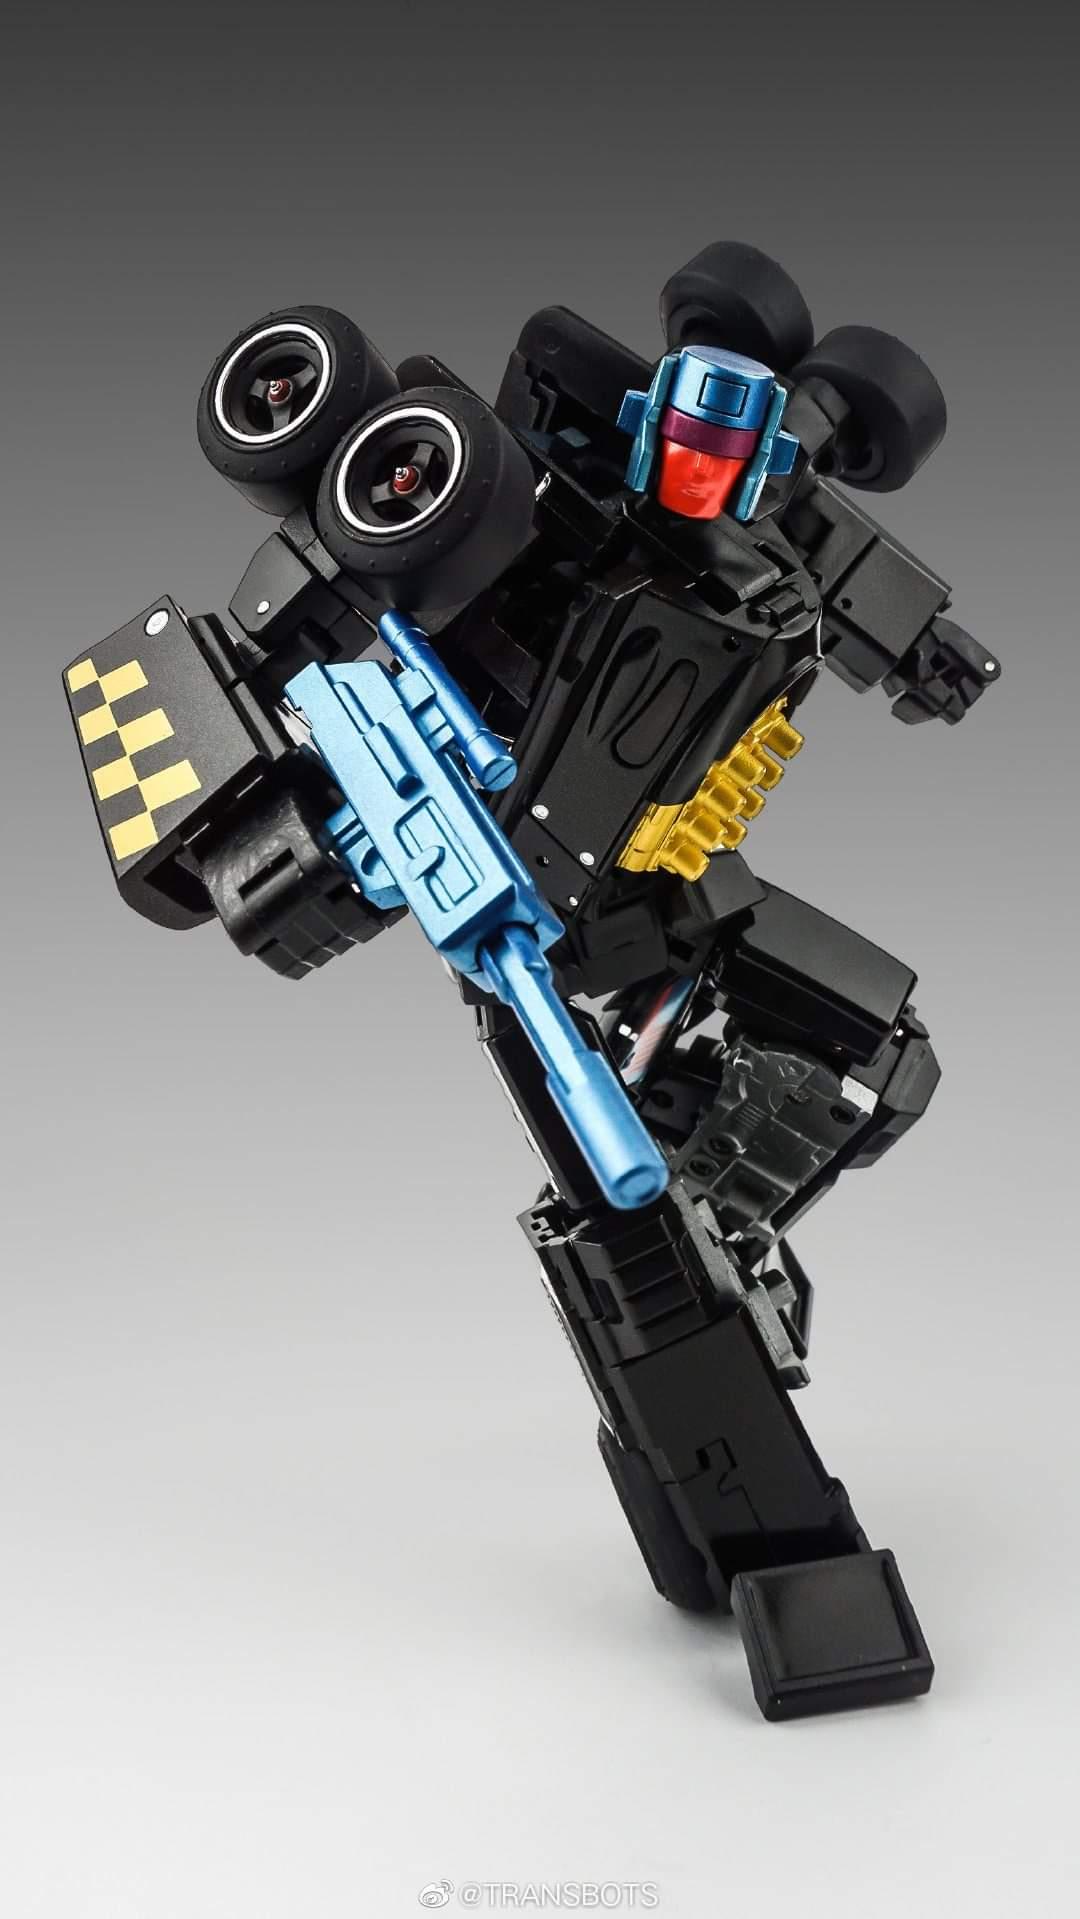 [X-Transbots] Produit Tiers - Jouets Berserkars forme Monolith (MX-XIII à MX-VII) - aka Stunticons forme Menasor/Menaseur - Page 6 OWJzHOpN_o